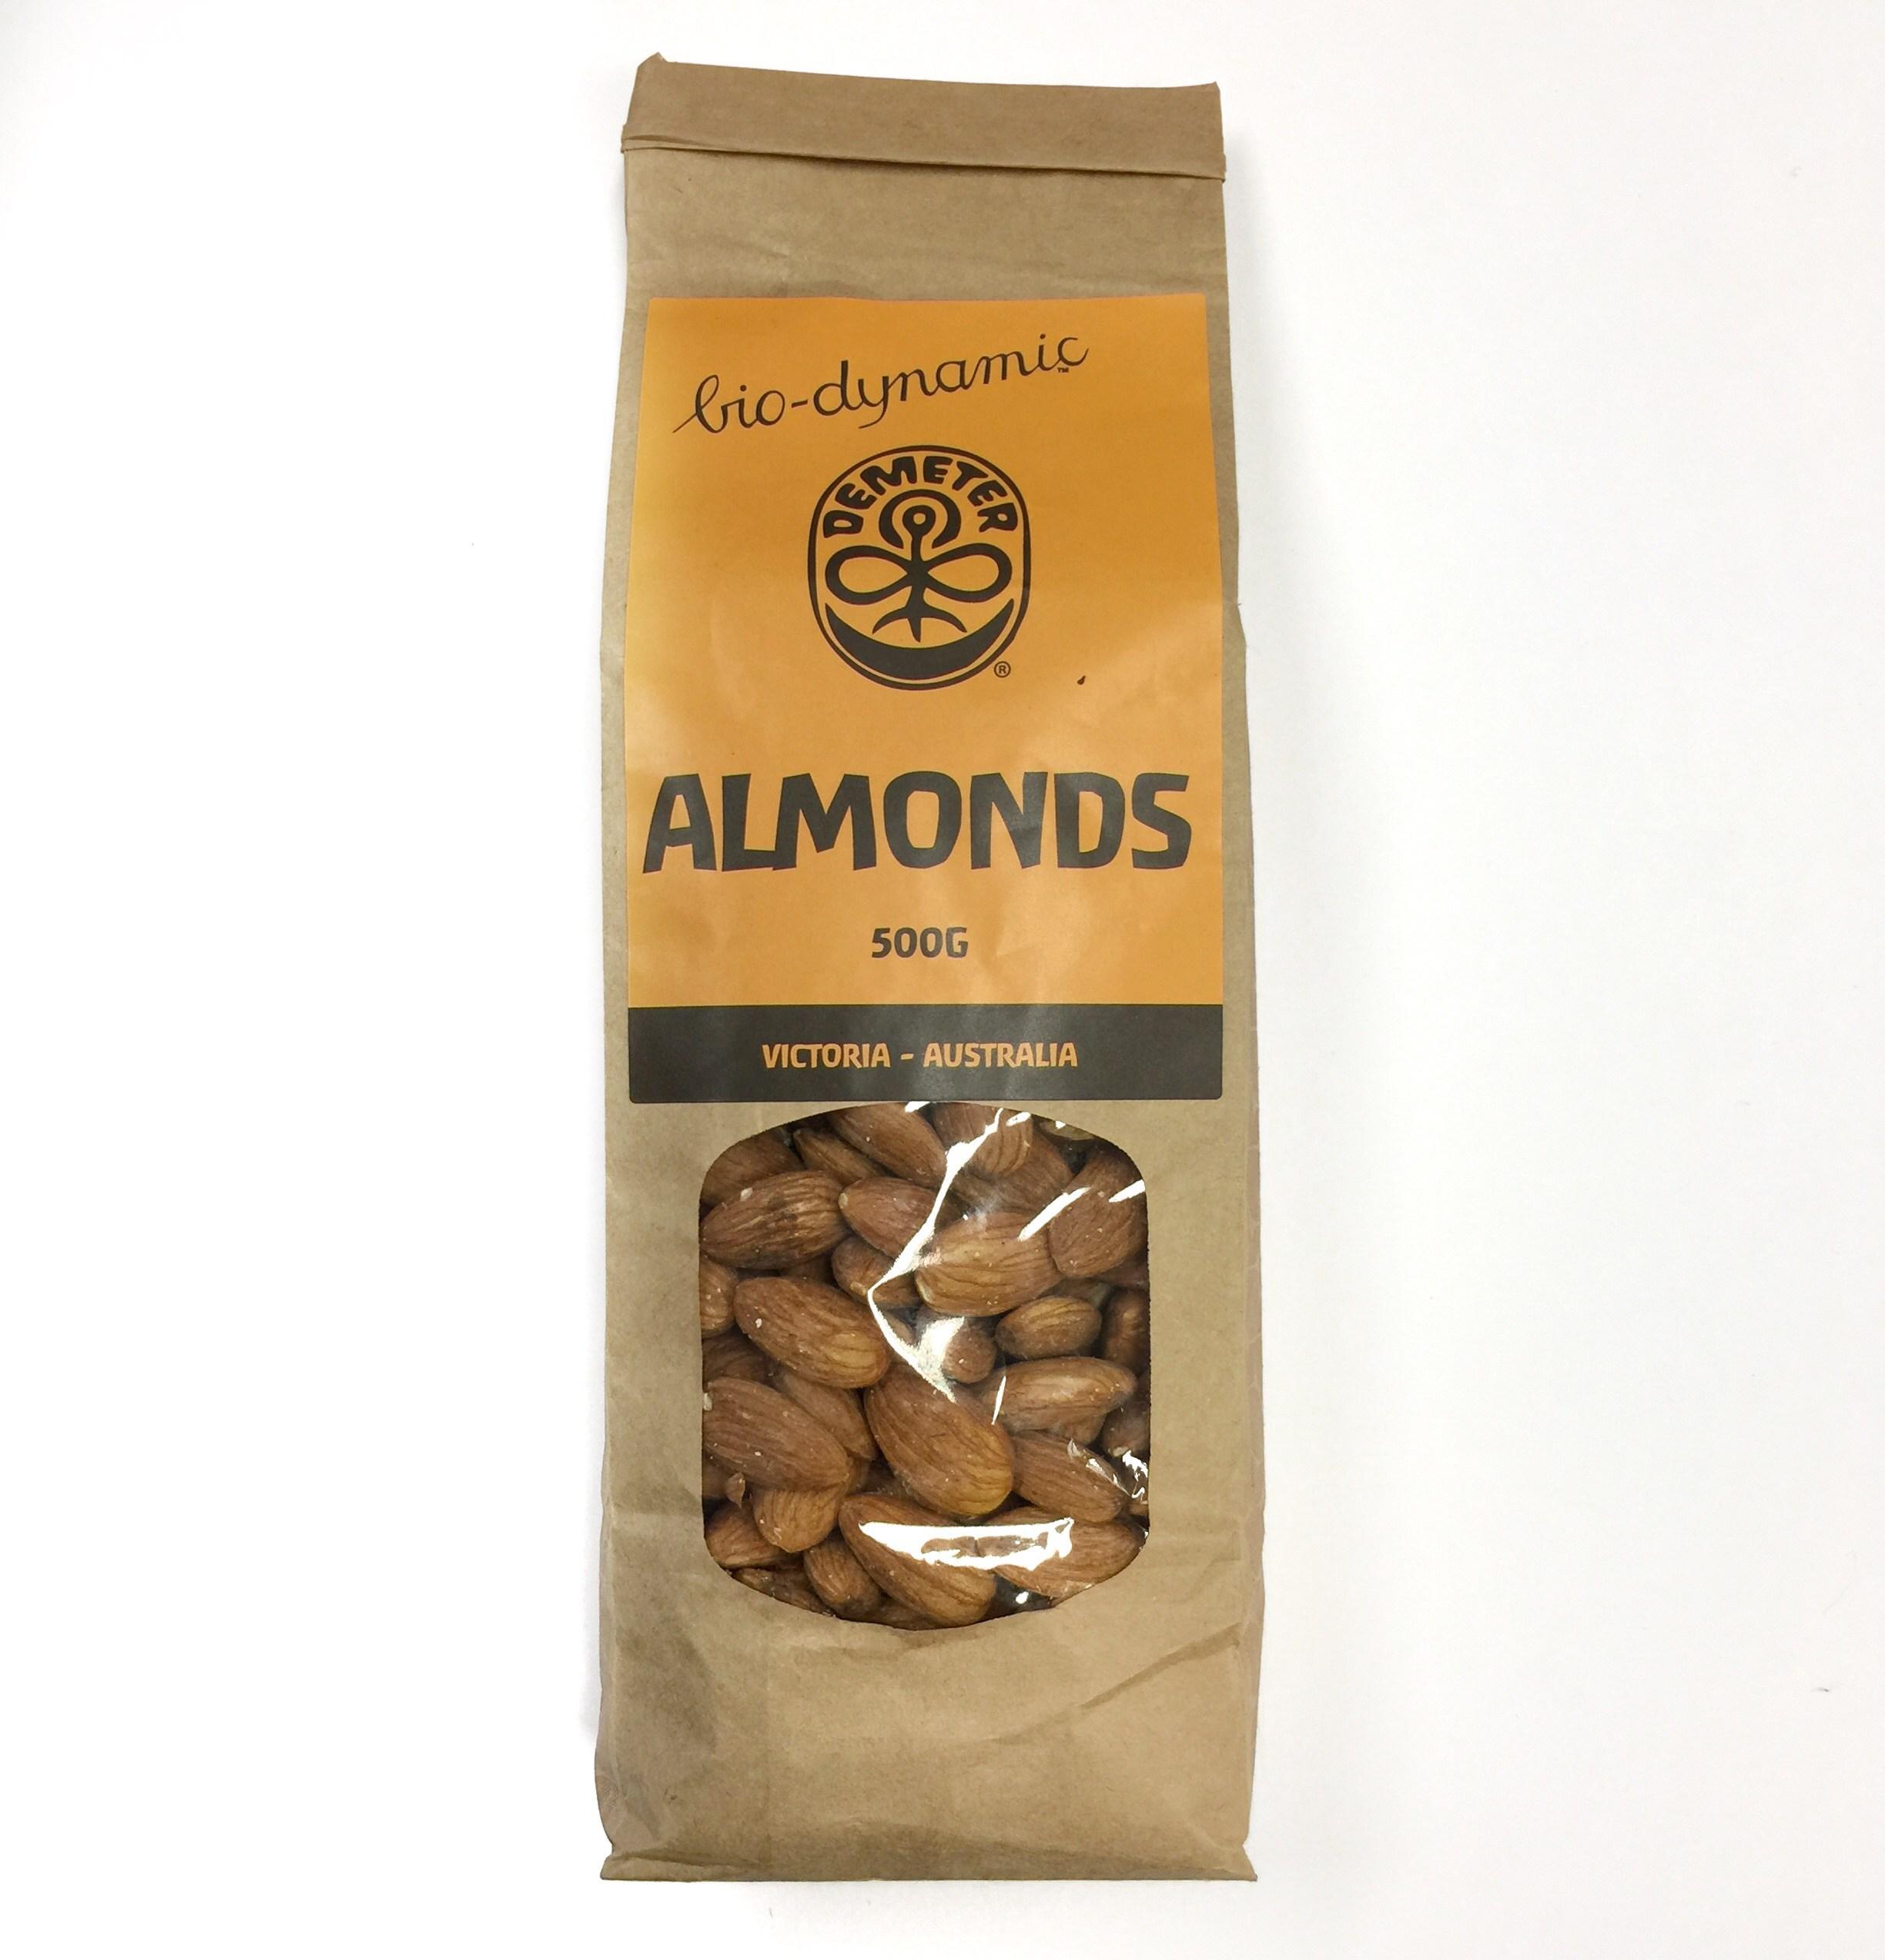 BioDynamic Almonds 500g